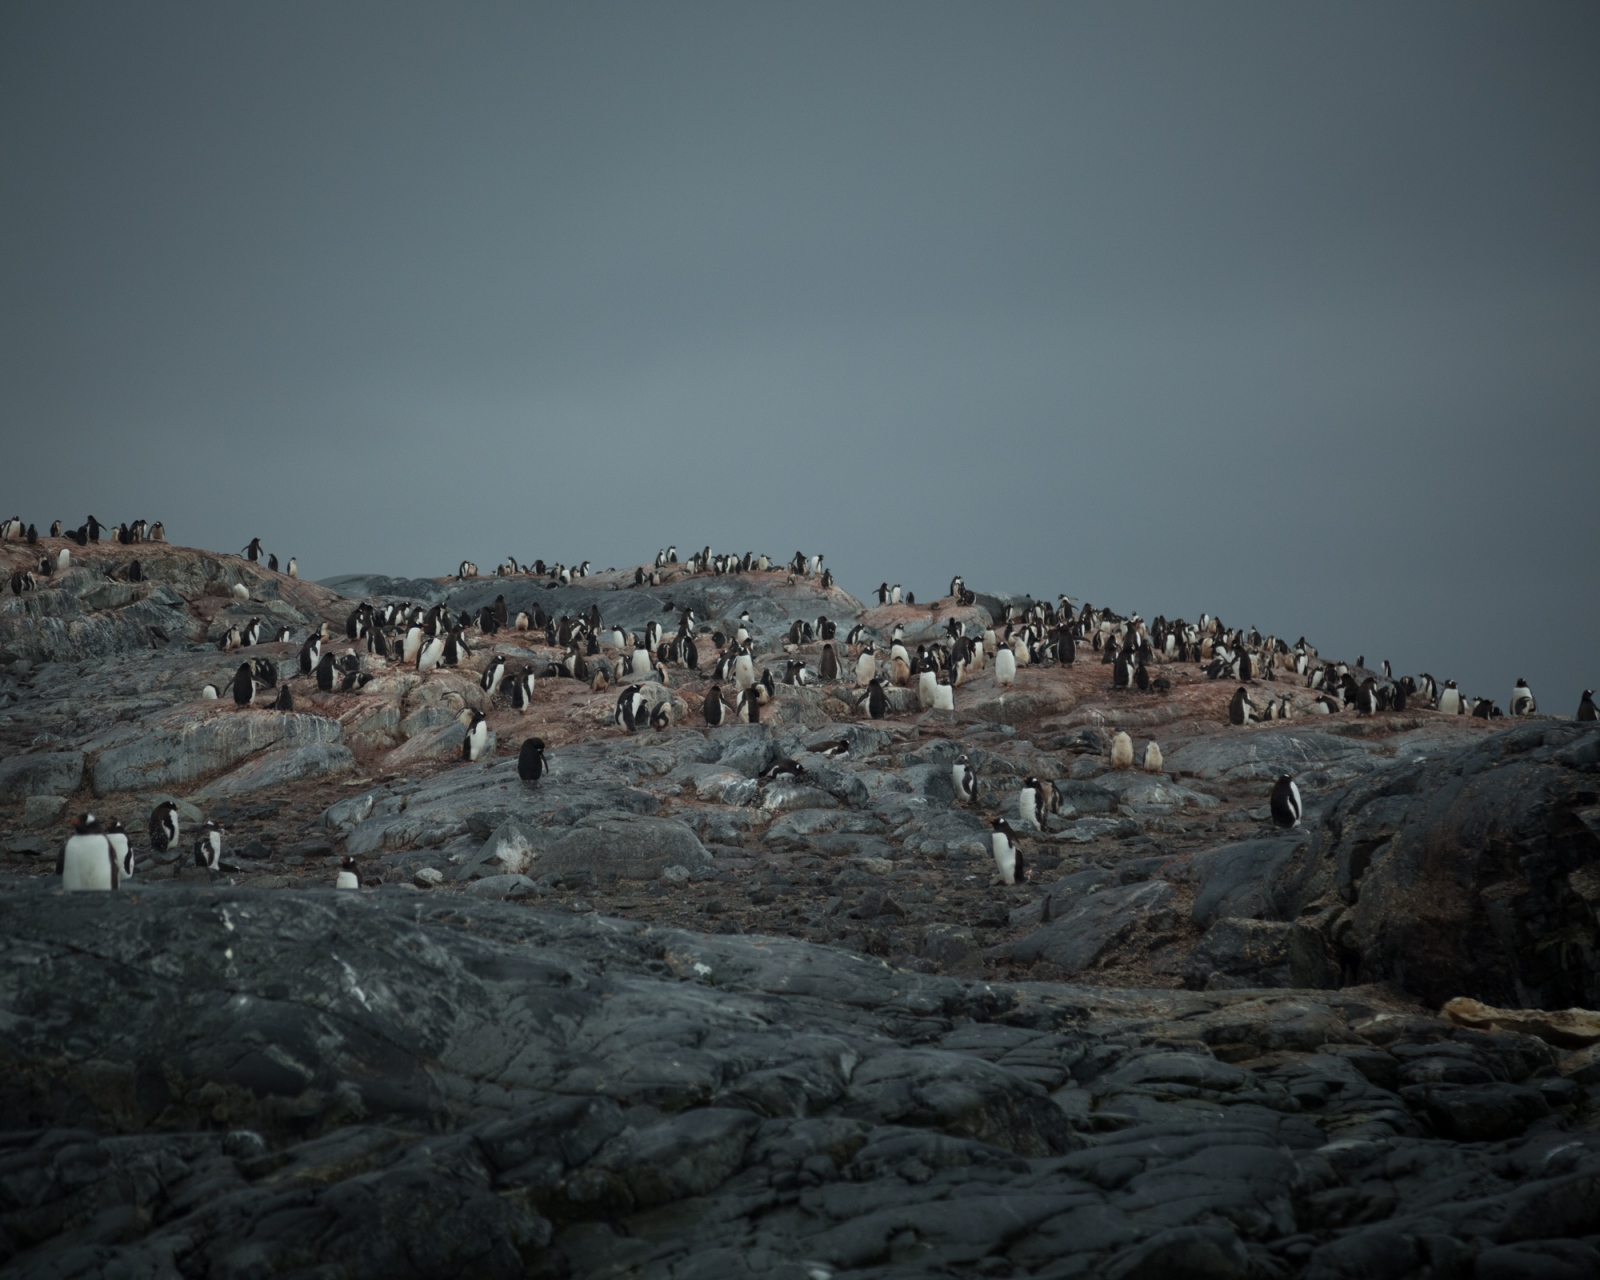 Art and Documentary Photography - Loading 0_Antarctica_UPLOAD_acaciajohnson_19.jpg